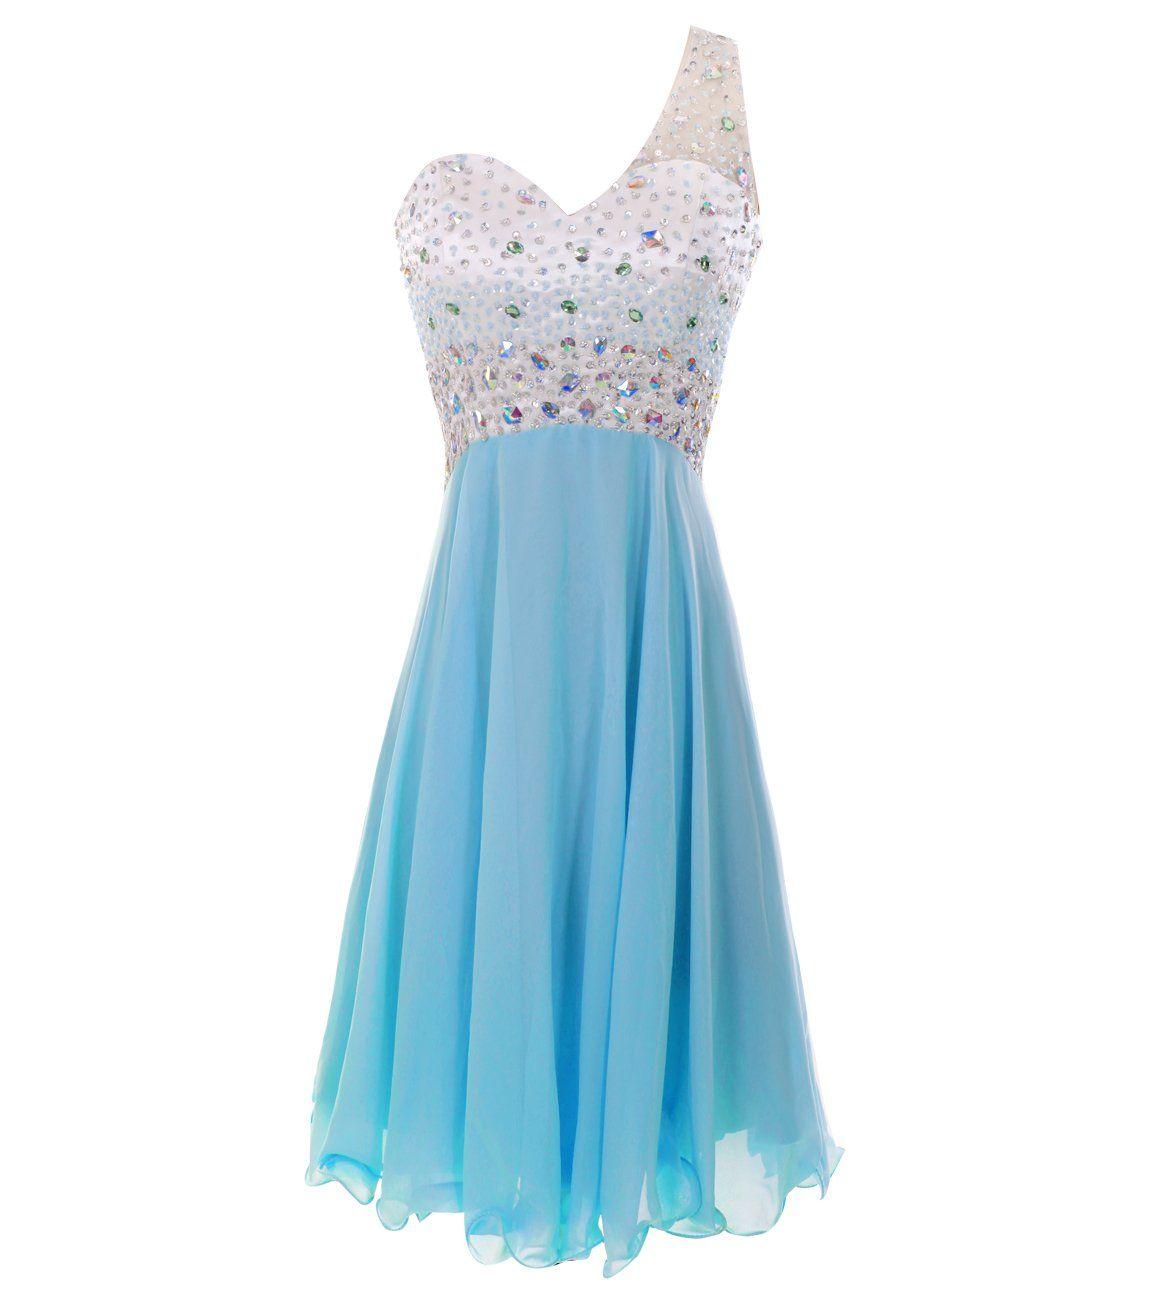 Melantha one shoulder homecoming dresses short prom dress beadings